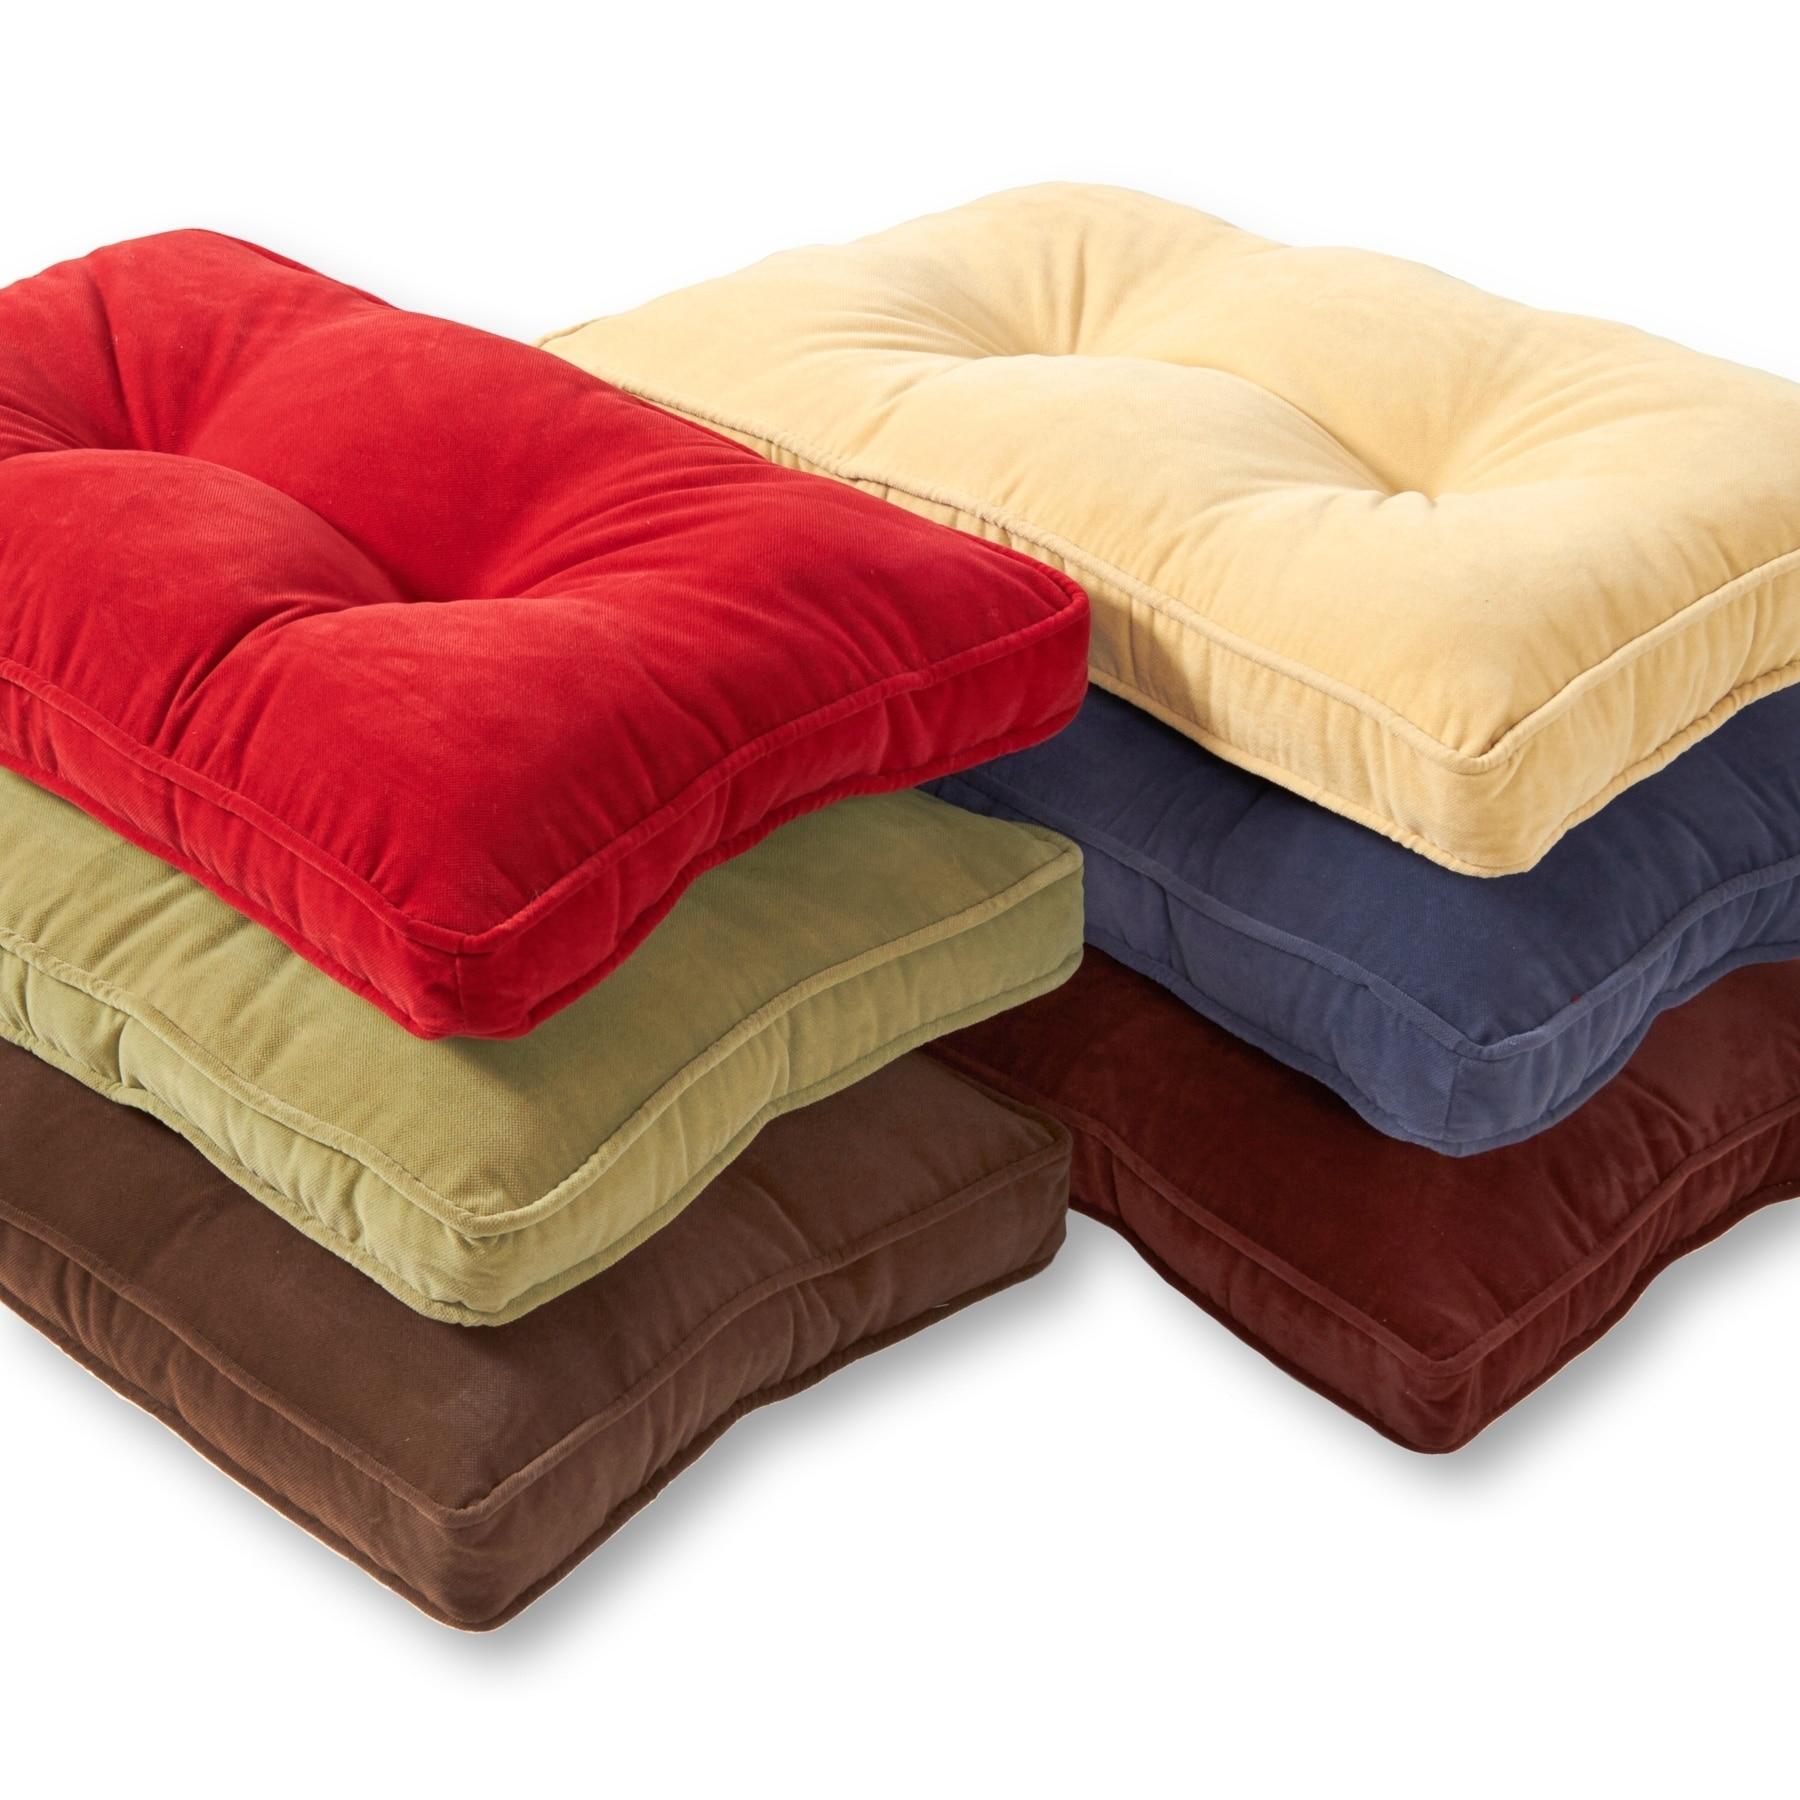 Shop Greendale Home Fashions Moss Hyatt 4 Pc Nook Cushion Set